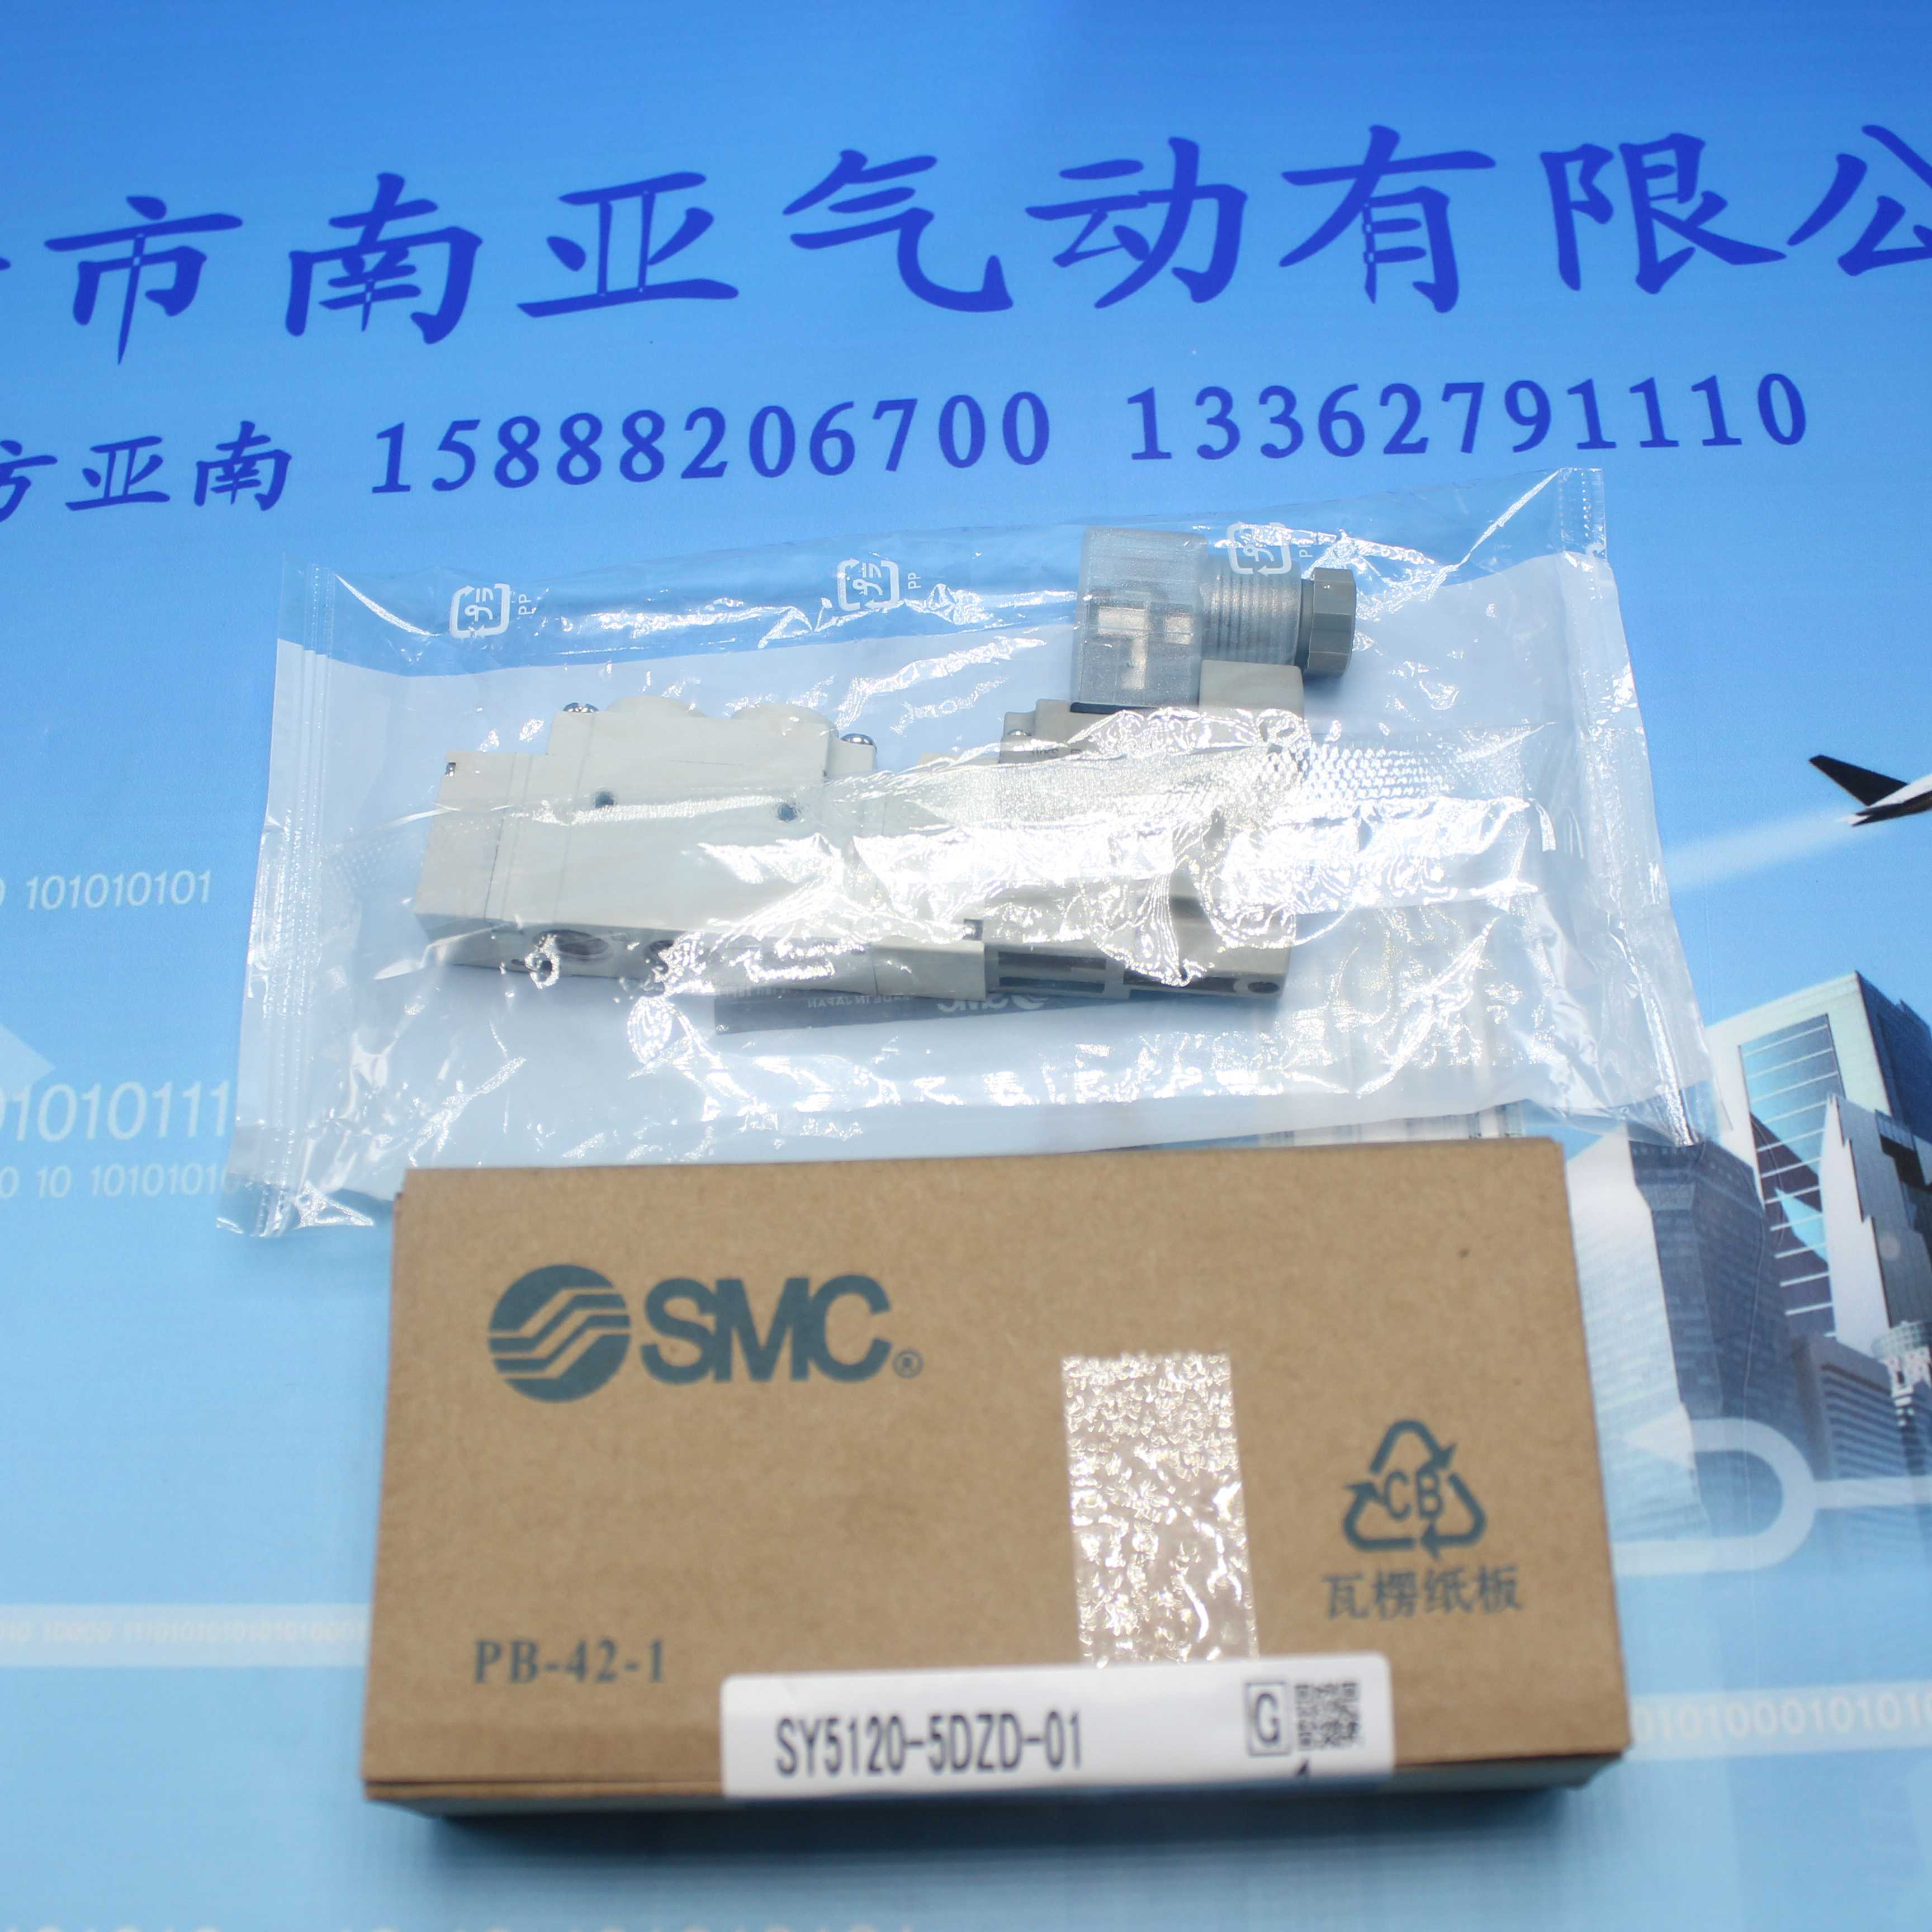 SY5120-3DZD-01 SY5120-4DZD-01 SY5120-5DZD-01 SY5120-6DZD-01  pneumatic components SMC solenoid valve удочка зимняя trout pro ql 201